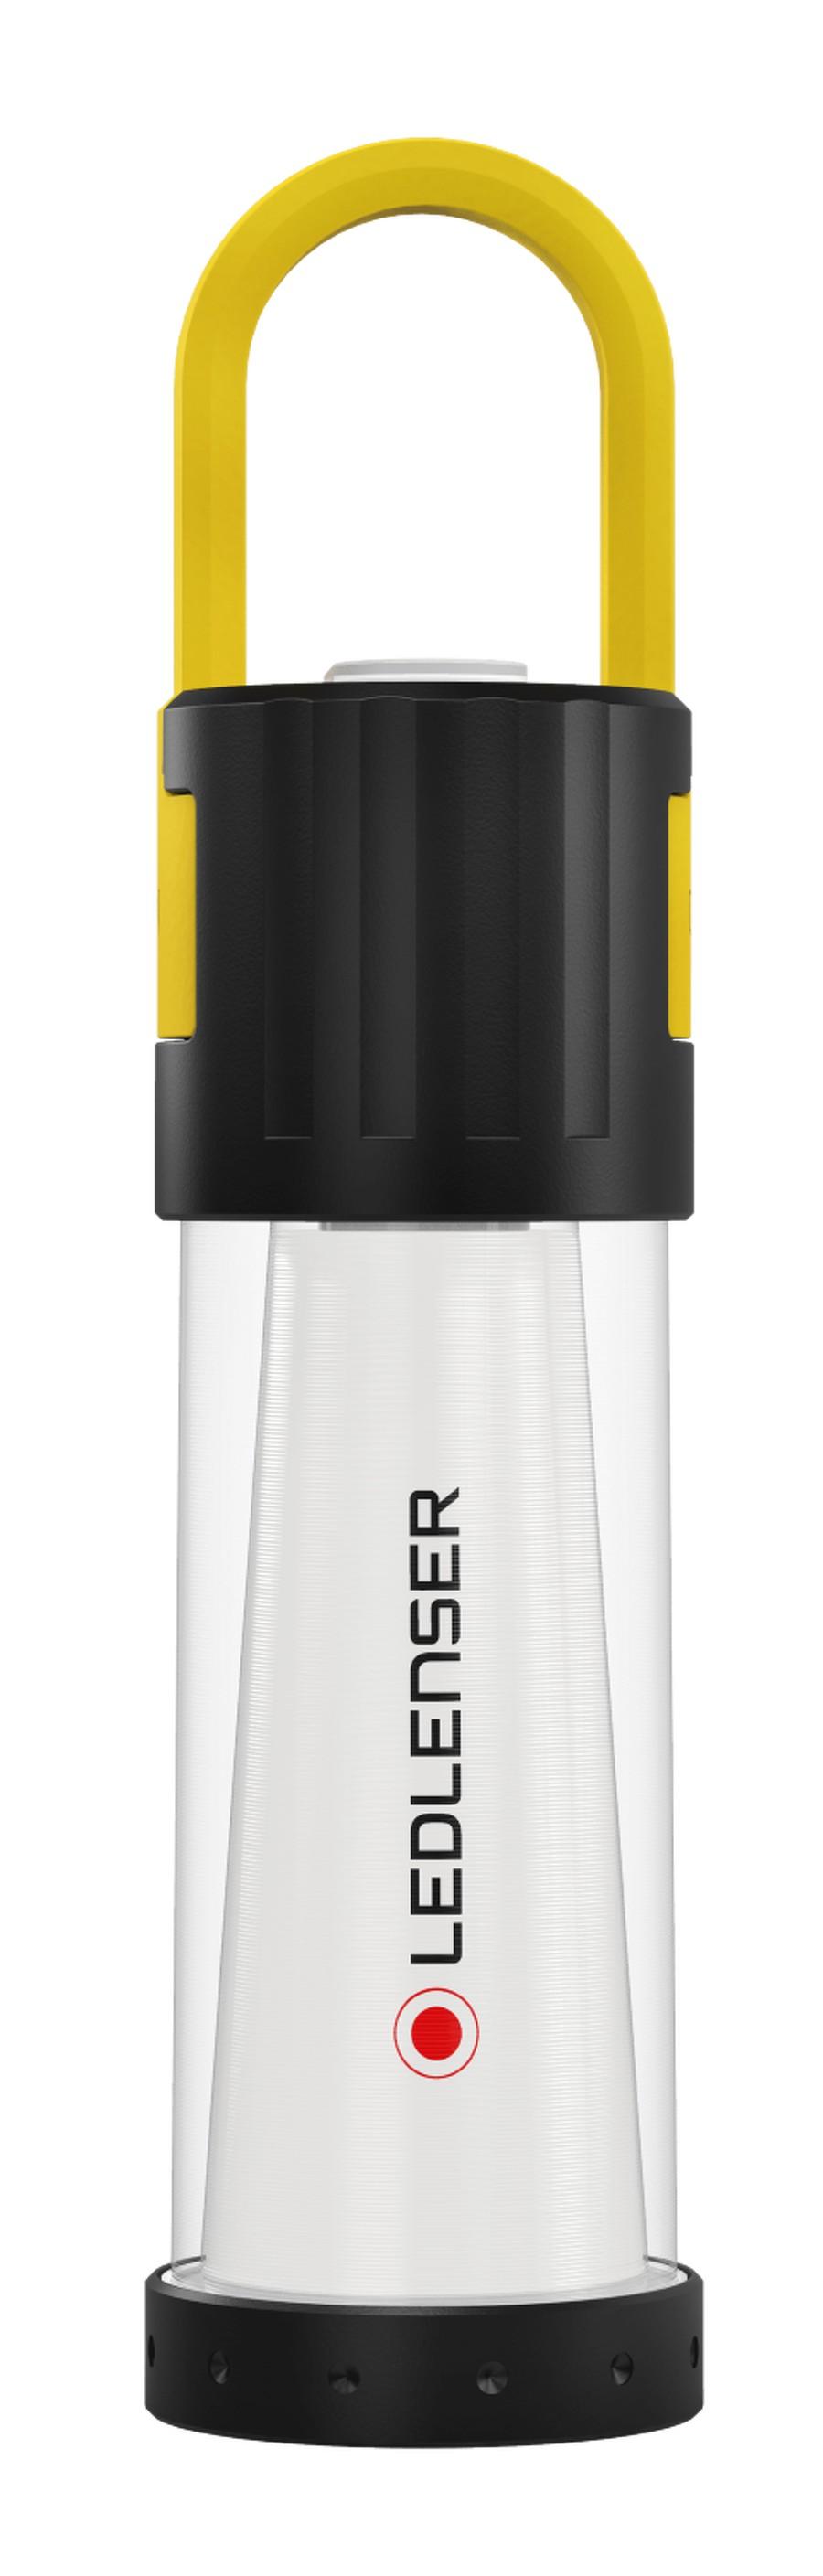 Ledlenser lanterne portative led rechargeable-iA6R